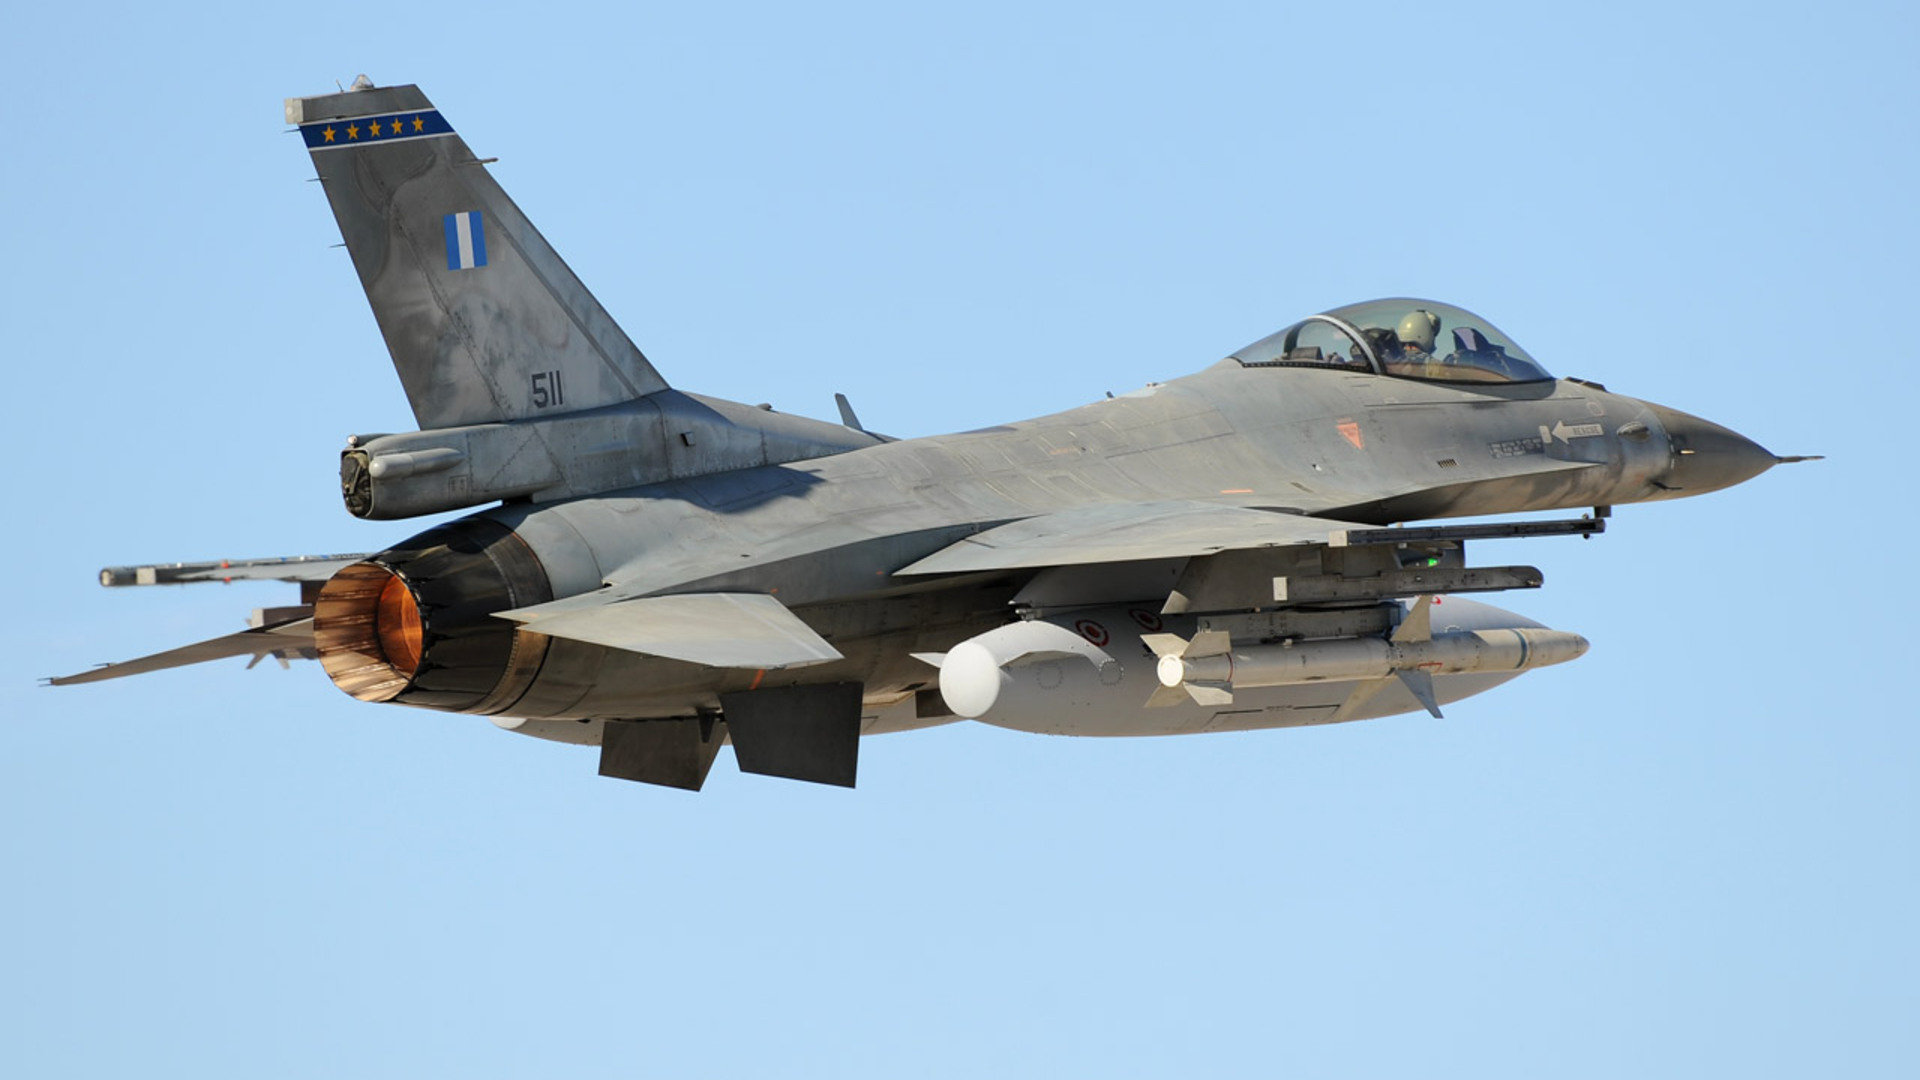 General Dynamics F 16 Fighting Falcon Hd Wallpaper: General Dynamics F-16 Fighting Falcon Wallpapers HD For